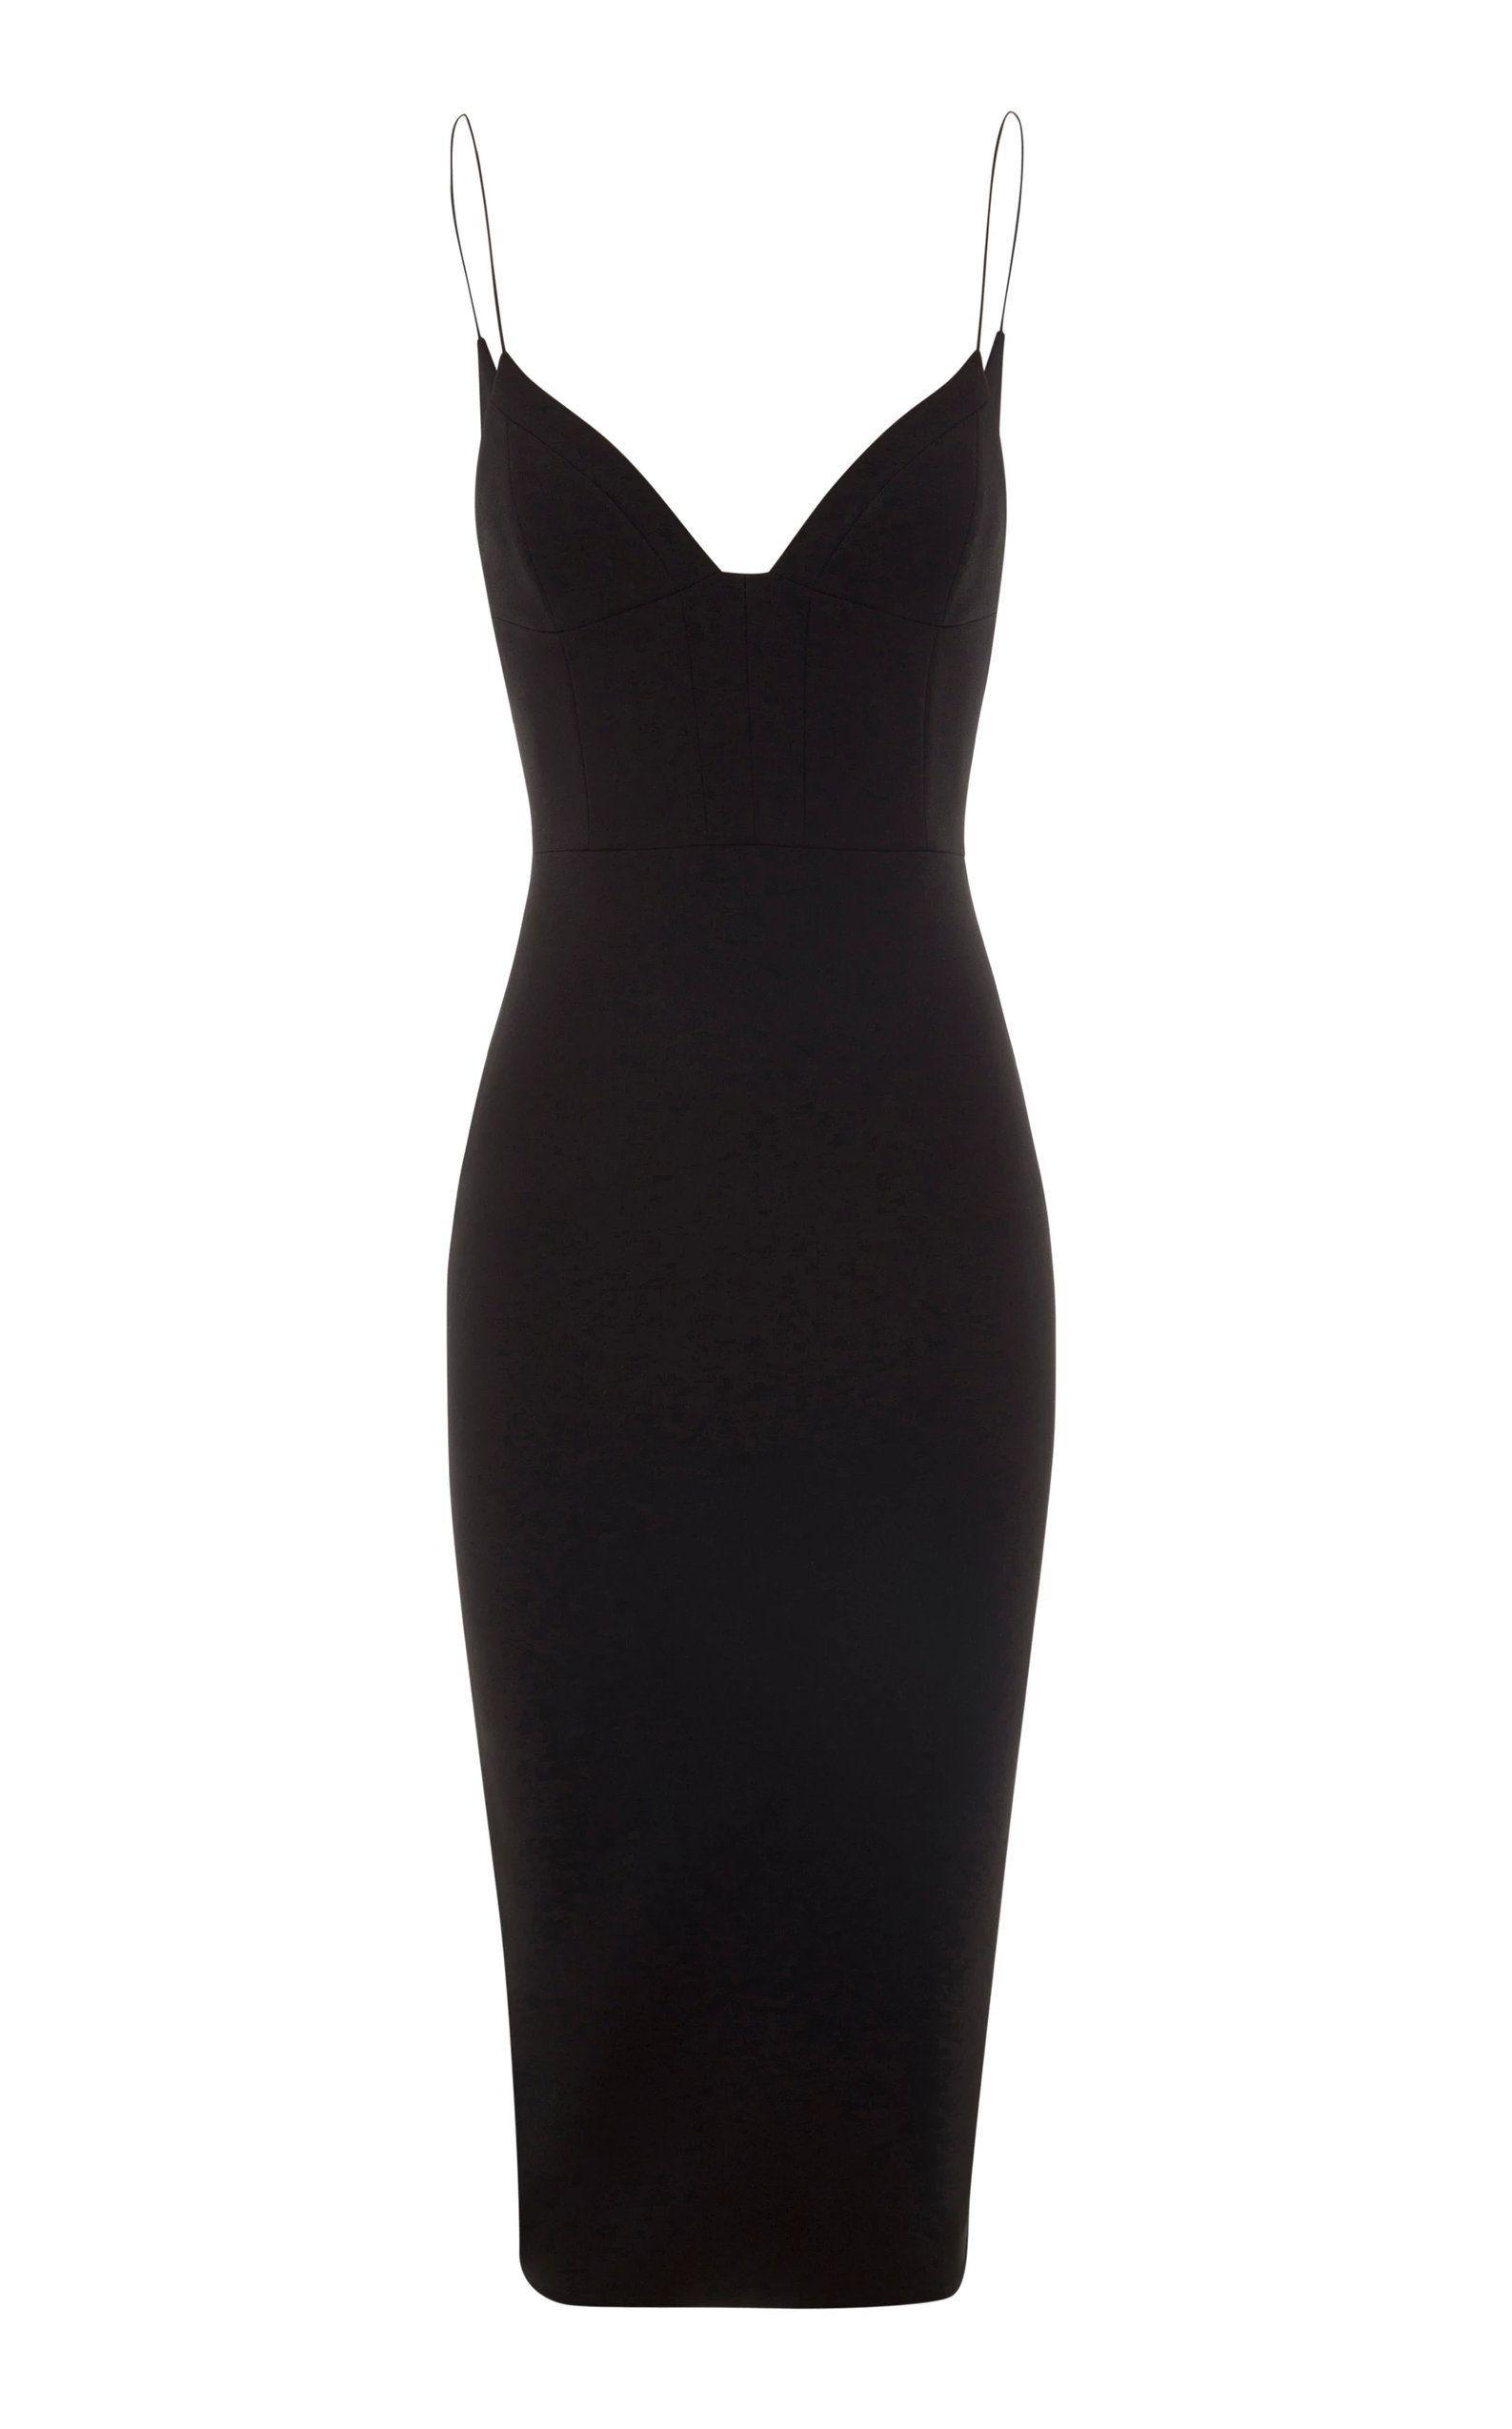 Alex Perry  Black Elodie Sleeveless V Neck Cocktail Dress#alex #black #cocktail #dress #elodie #neck #perry #sleeveless